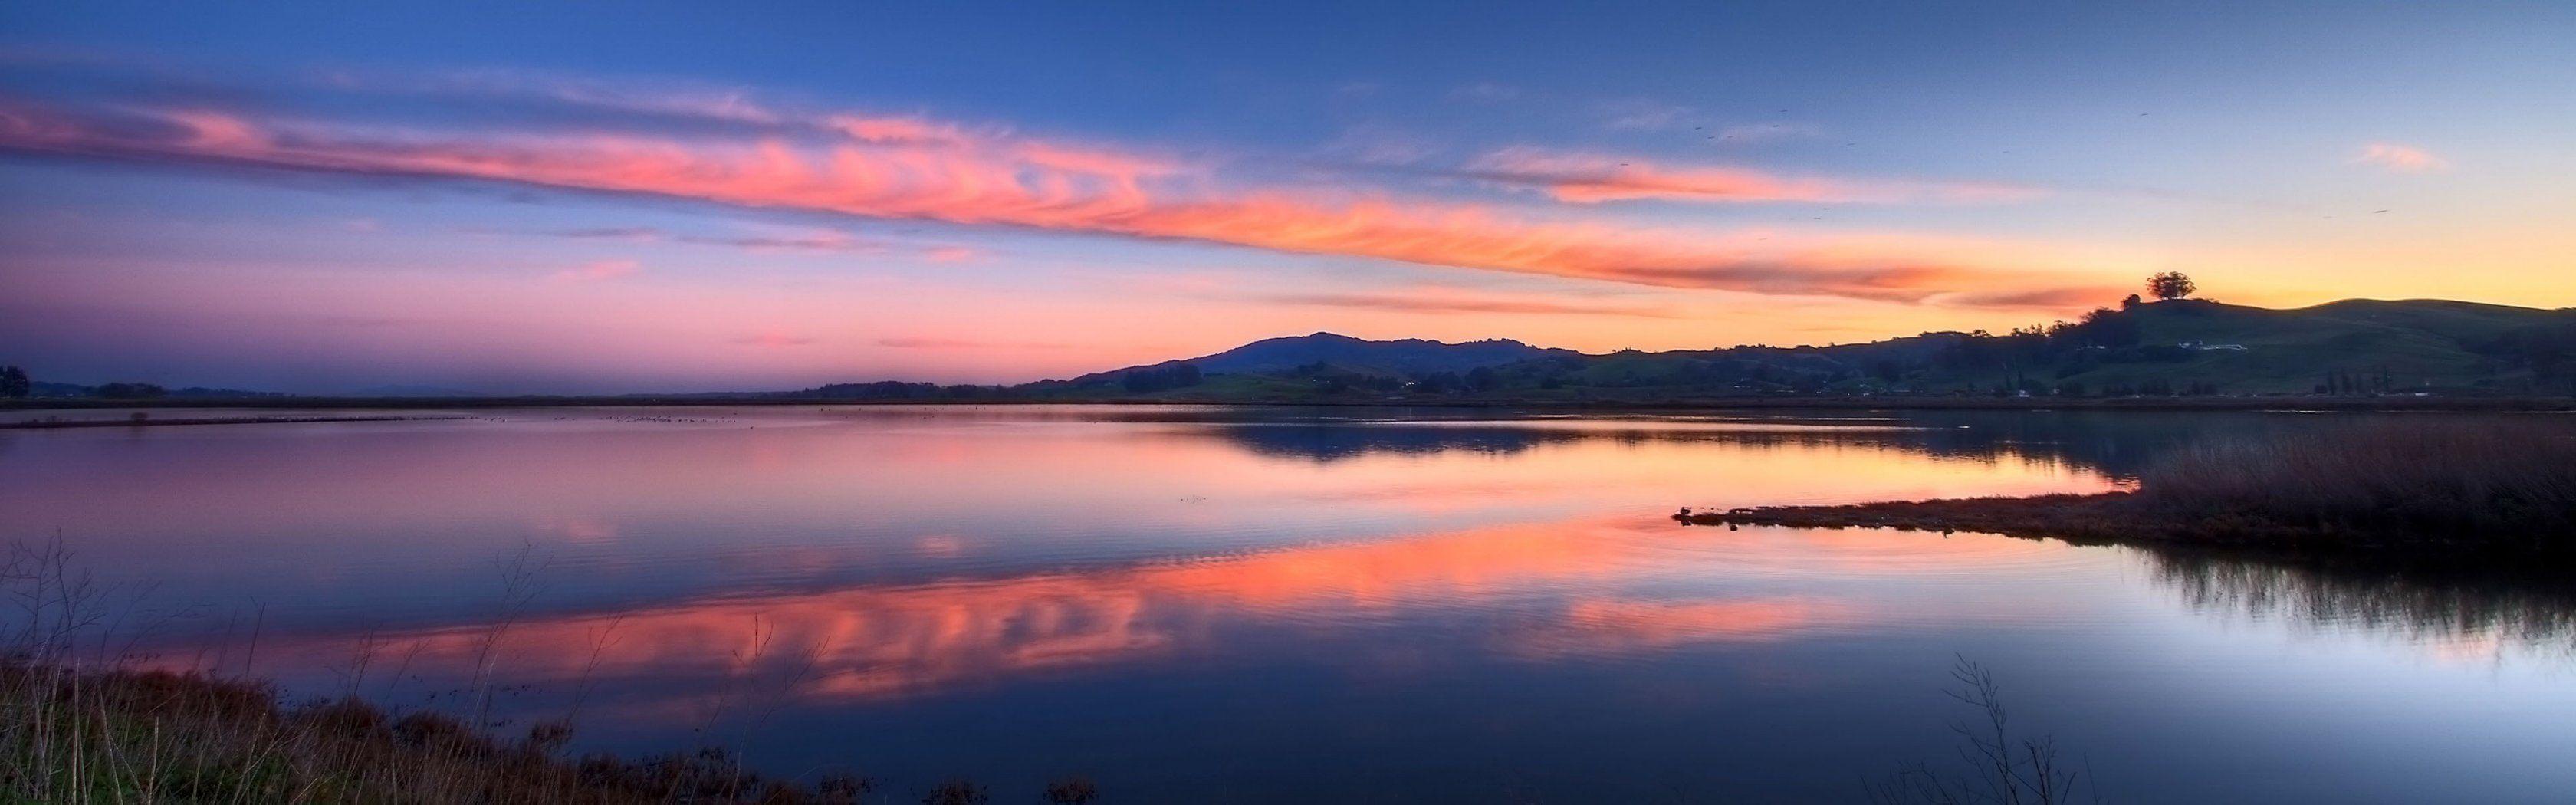 Thats A Wide Angle Landscape Photography Creative Landscape Lake Landscape